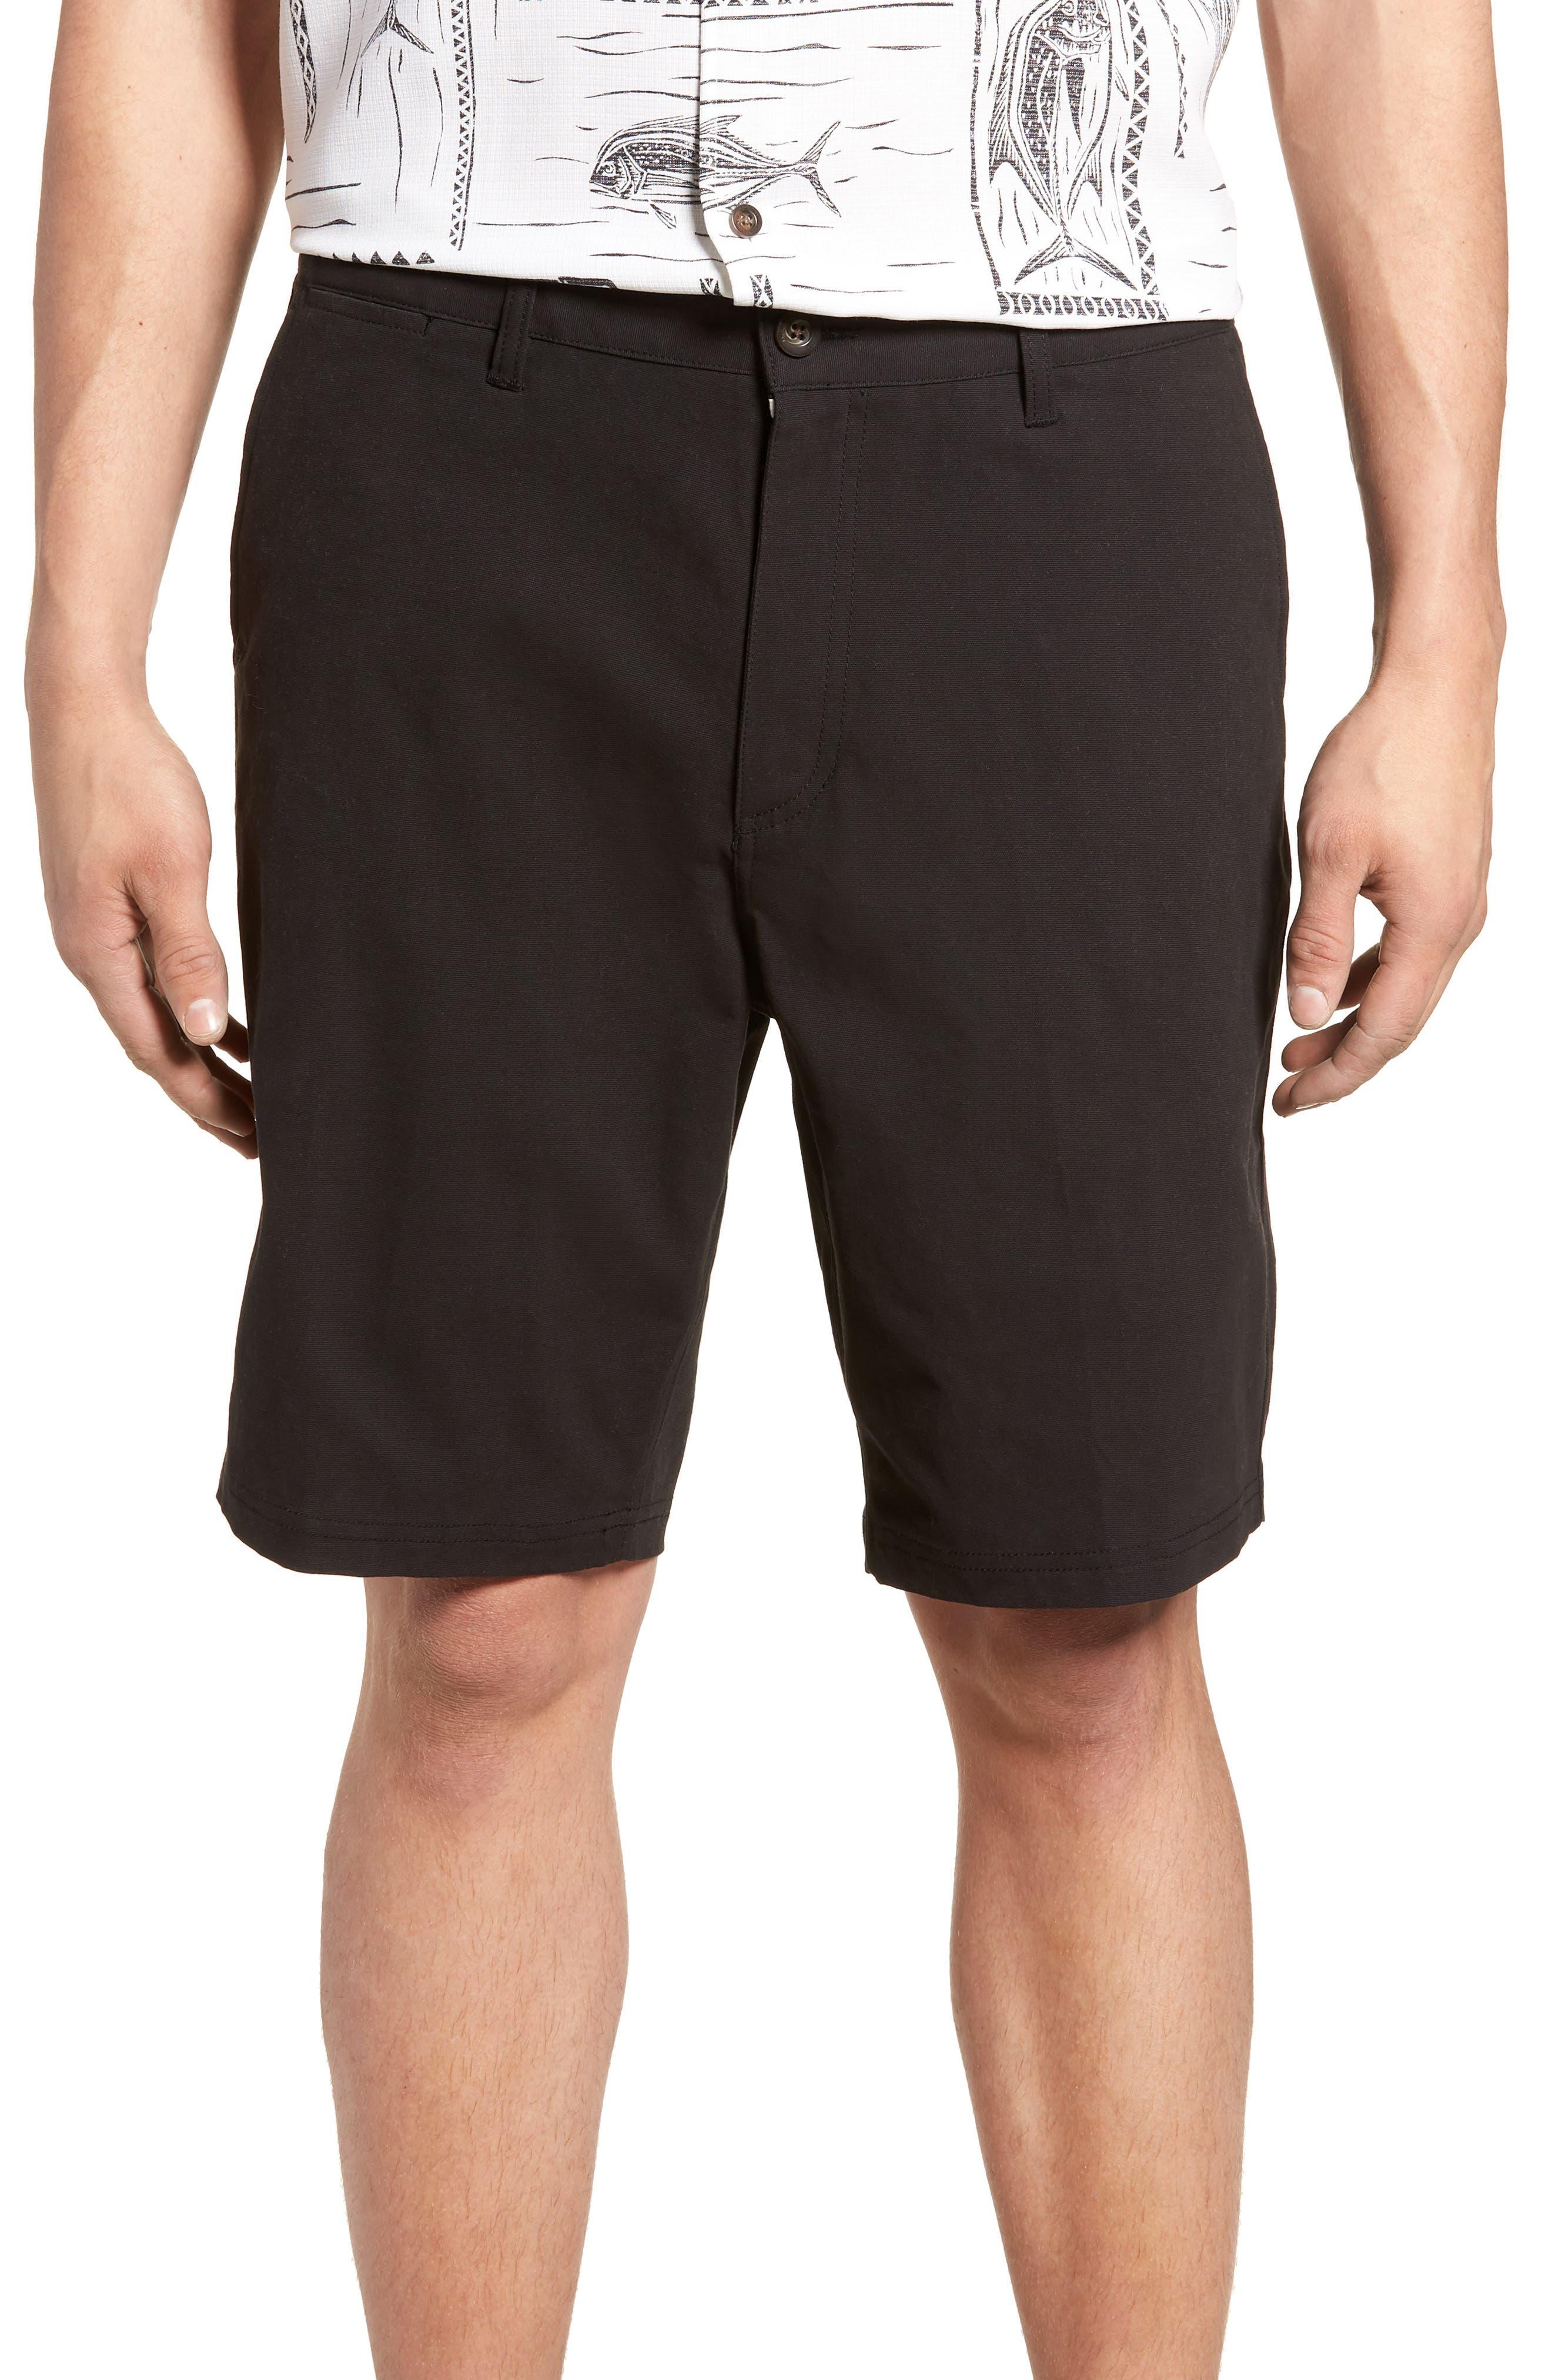 Port Shorts,                             Main thumbnail 1, color,                             BLACK